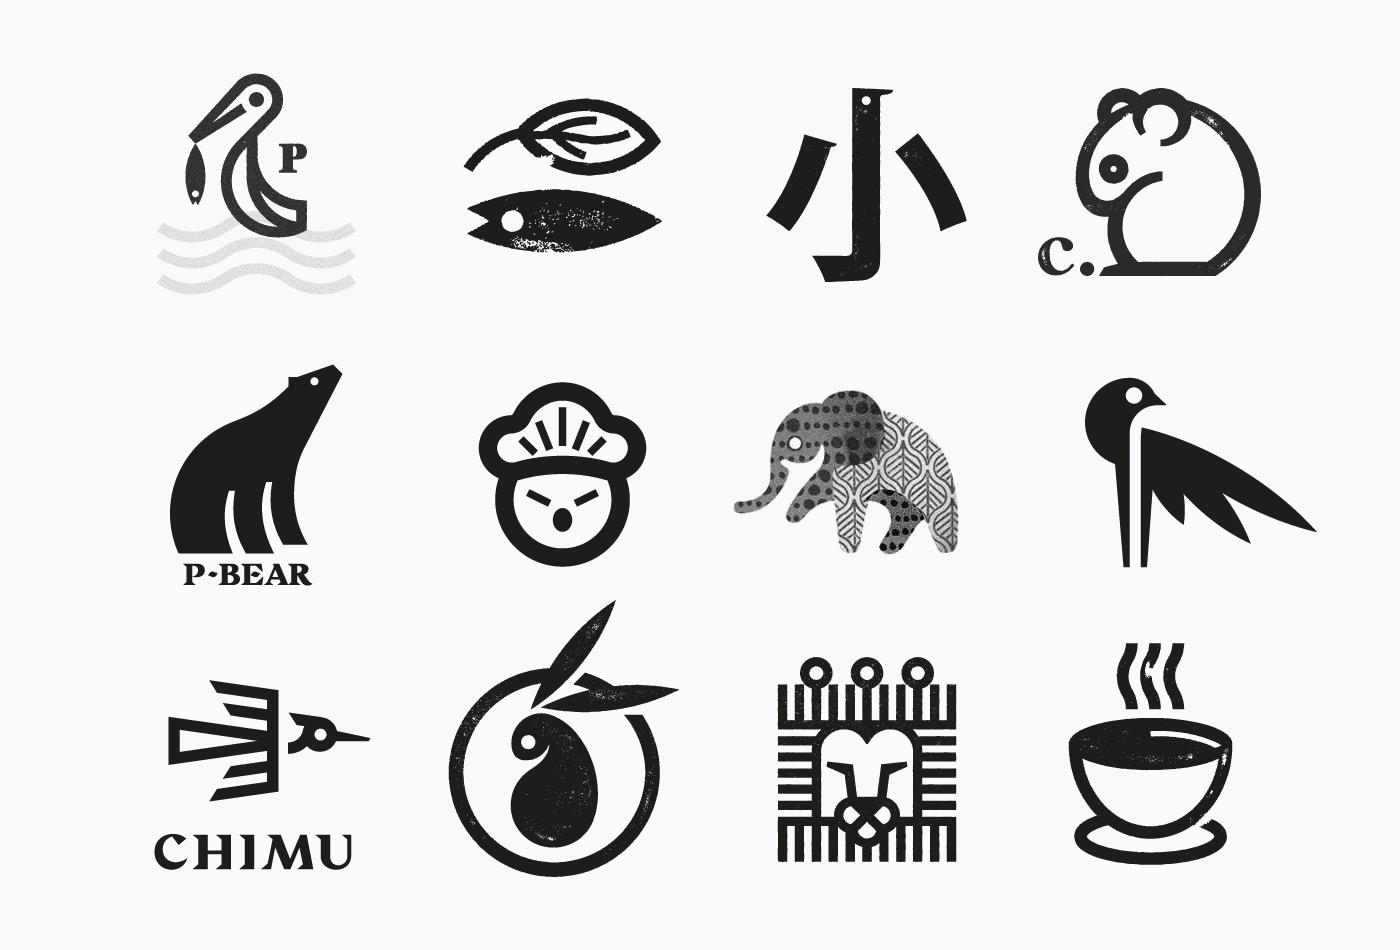 mark-logo-logos-logotype-brand-branding-pittogramma-vacaliebres-marks-pictograms-signs